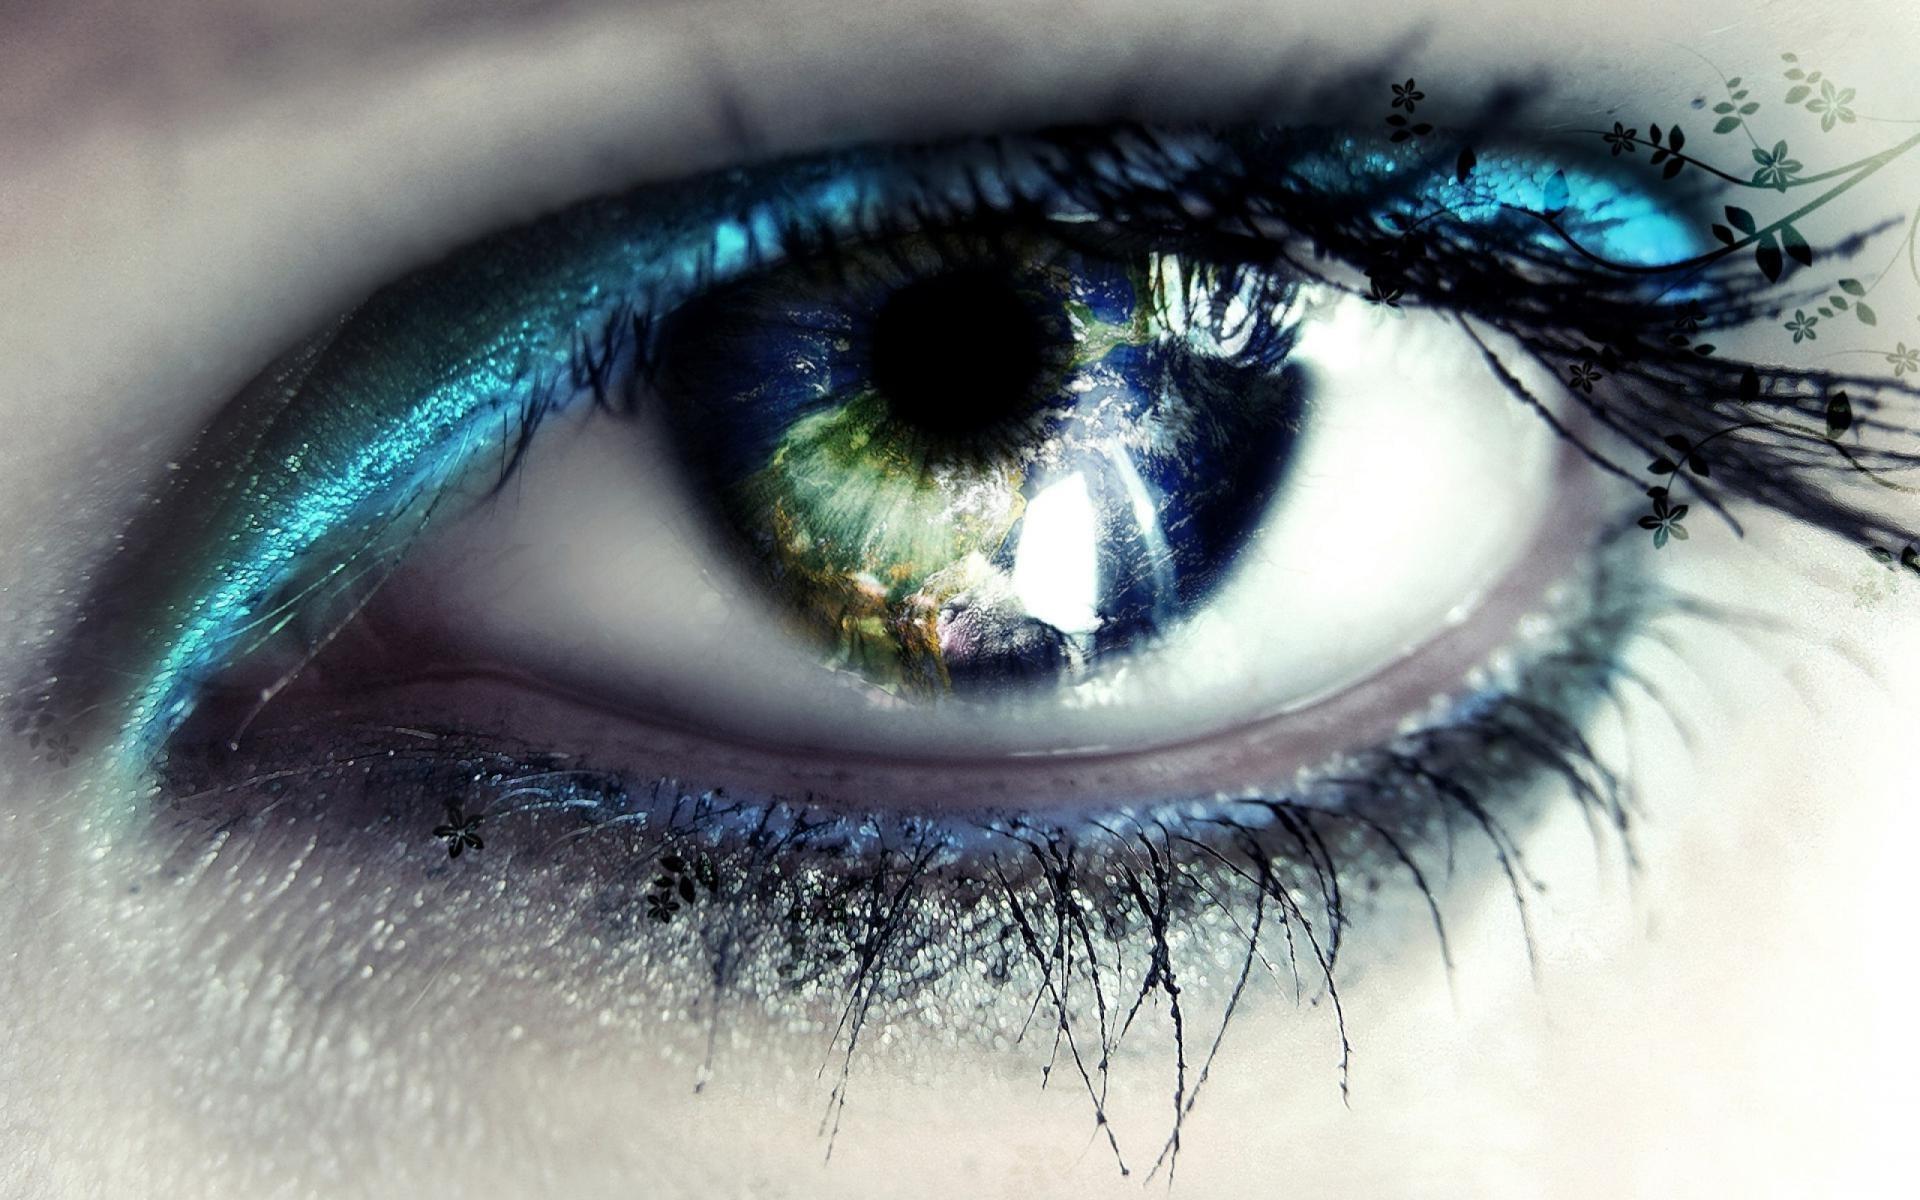 Mystical eye wallpaper 2701 1920x1200